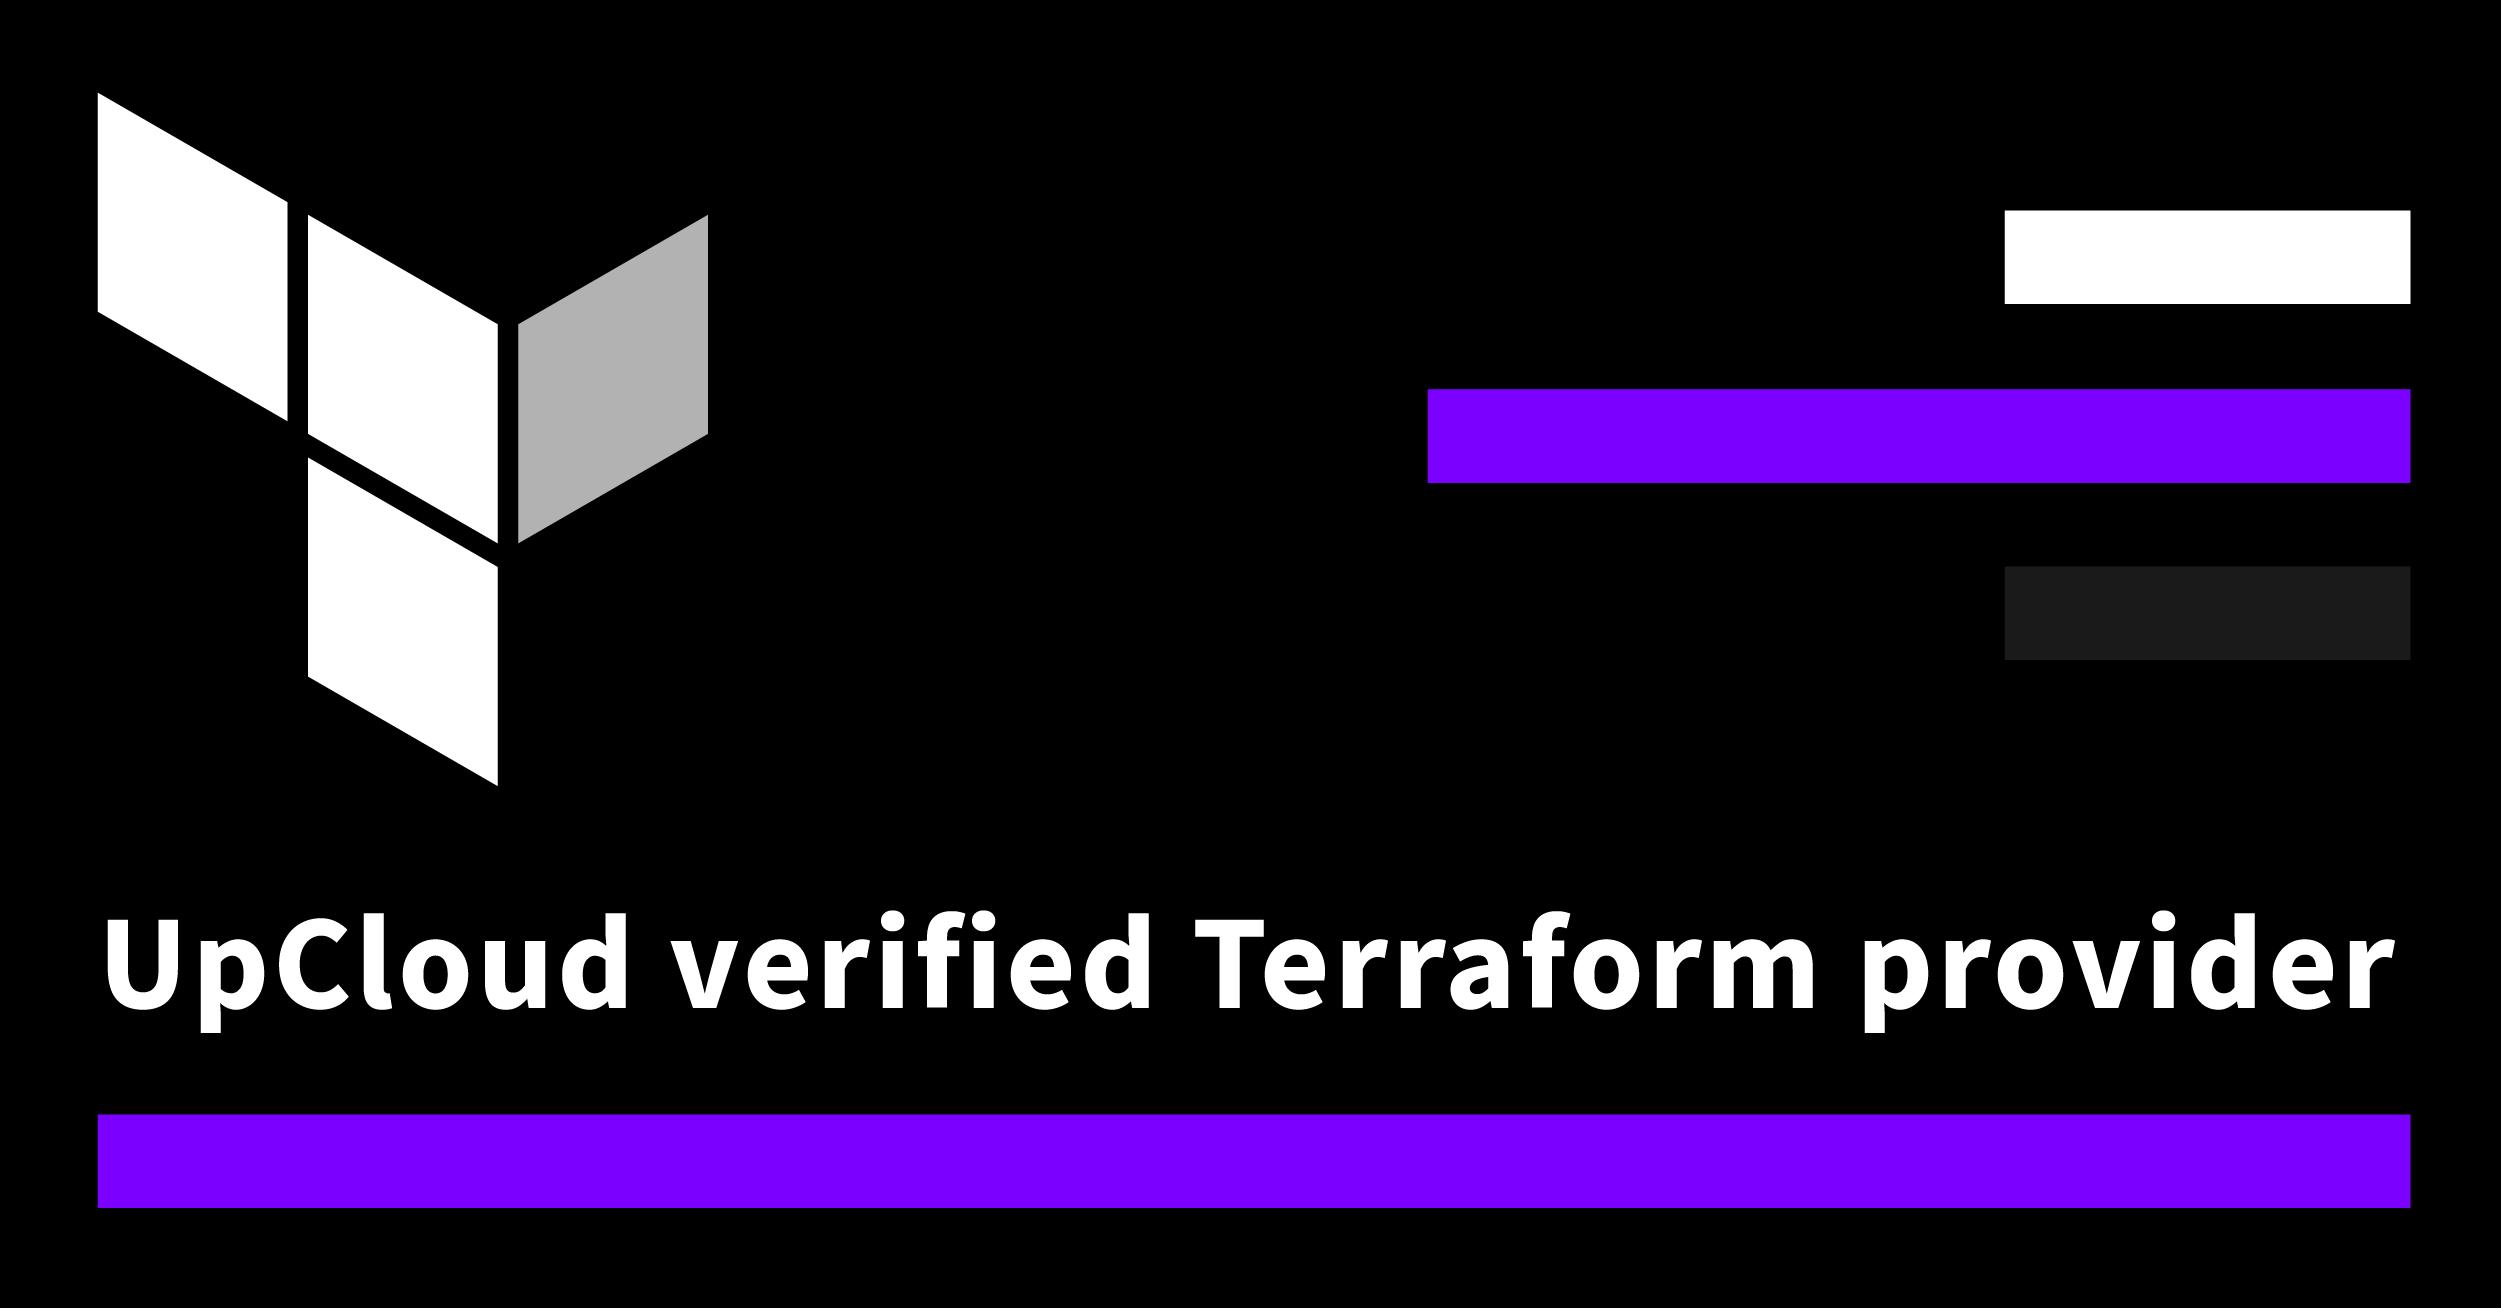 UpCloud verified Terraform provider